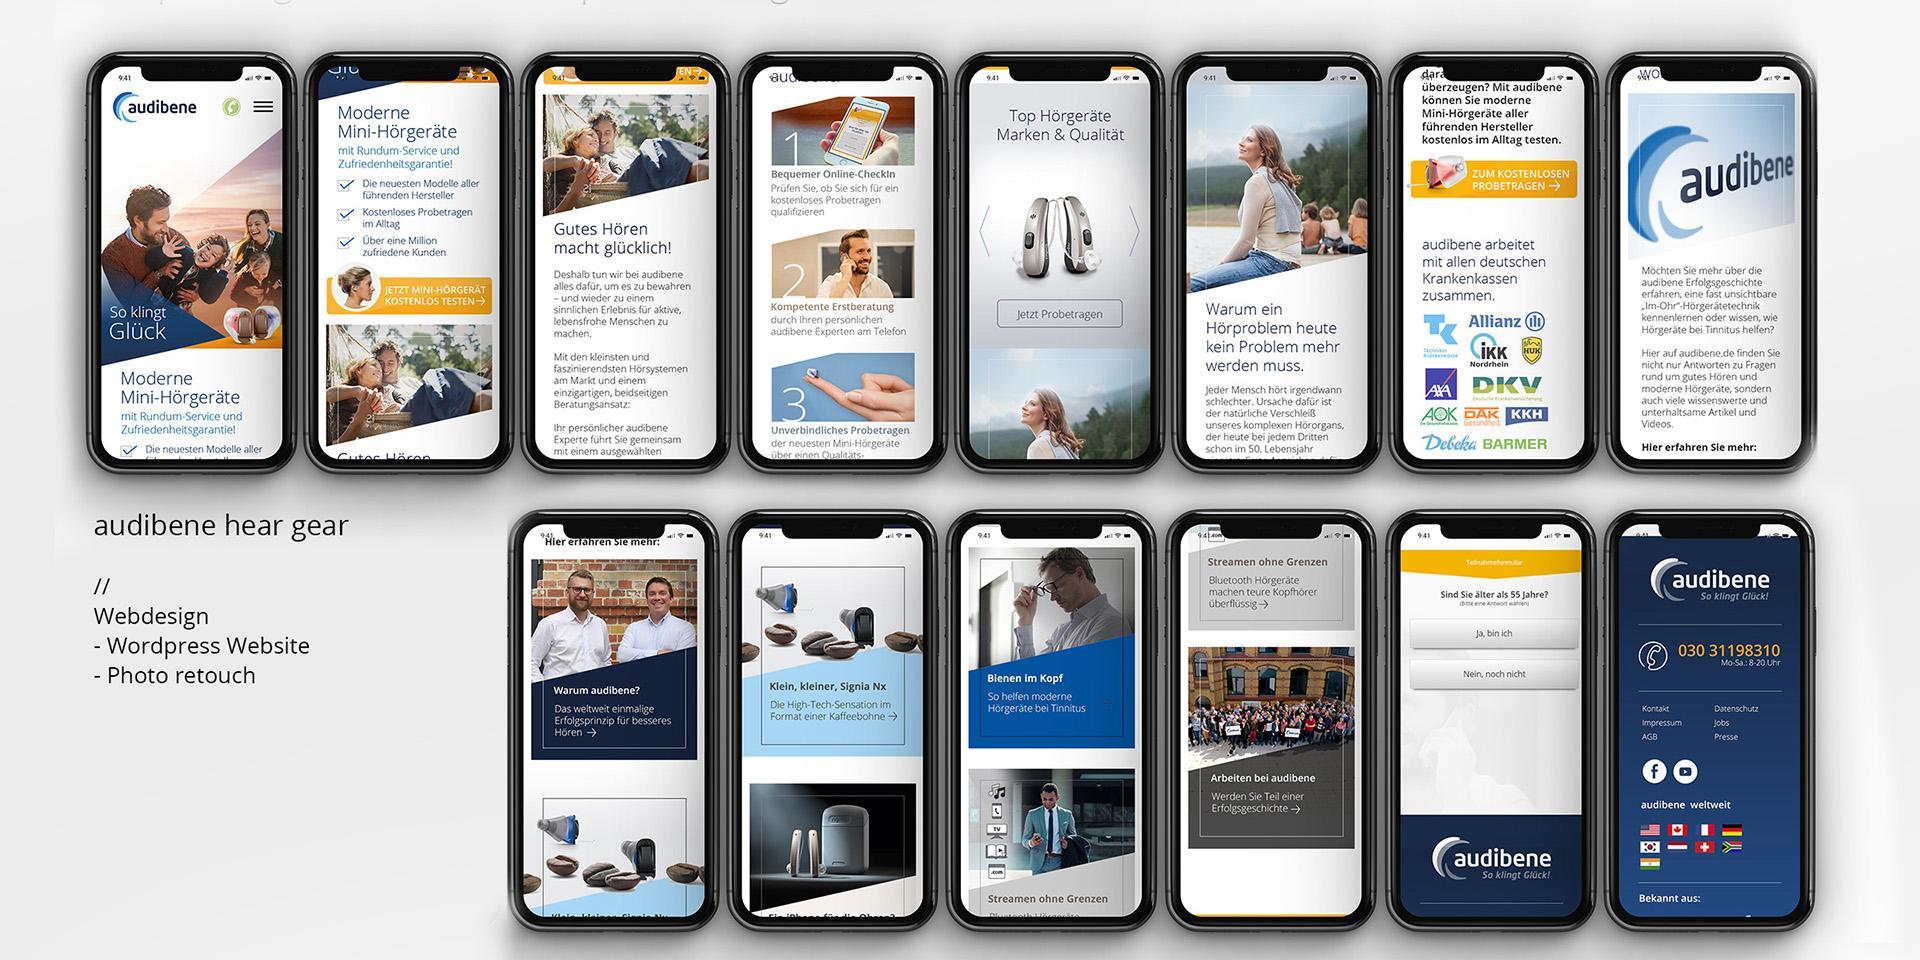 gfd ab website 3 mobile werbeagentur werbung grafik print Kreativ agentur muenchen full service 360 marketing